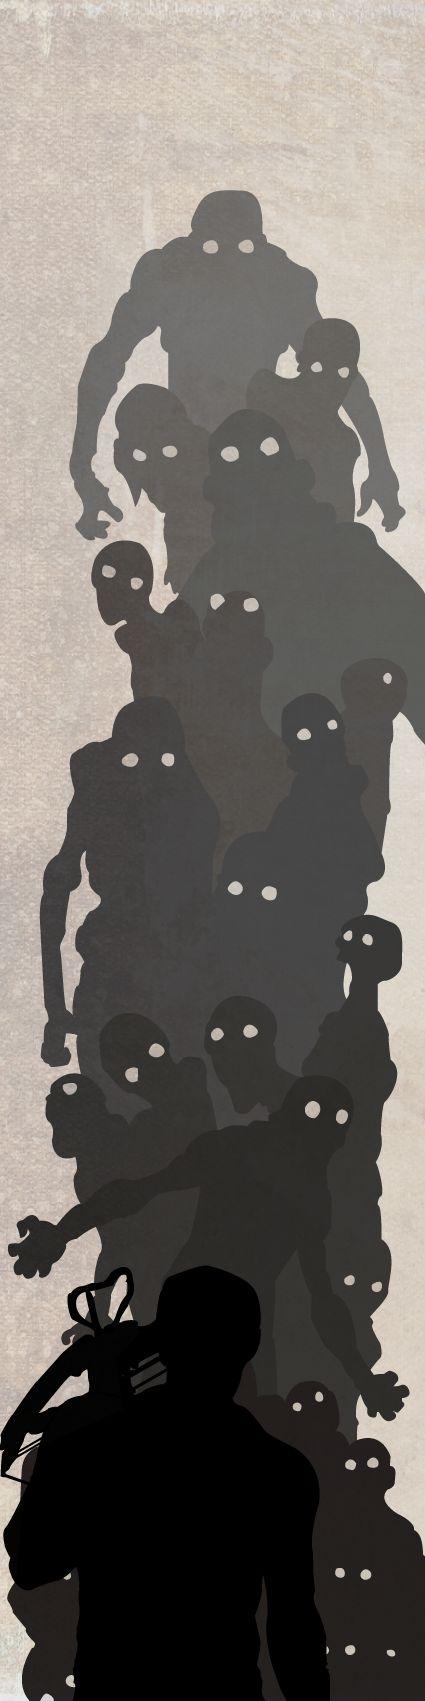 The walking dead, Daryl Dixon by Ank van Stekelenburg, via Behance